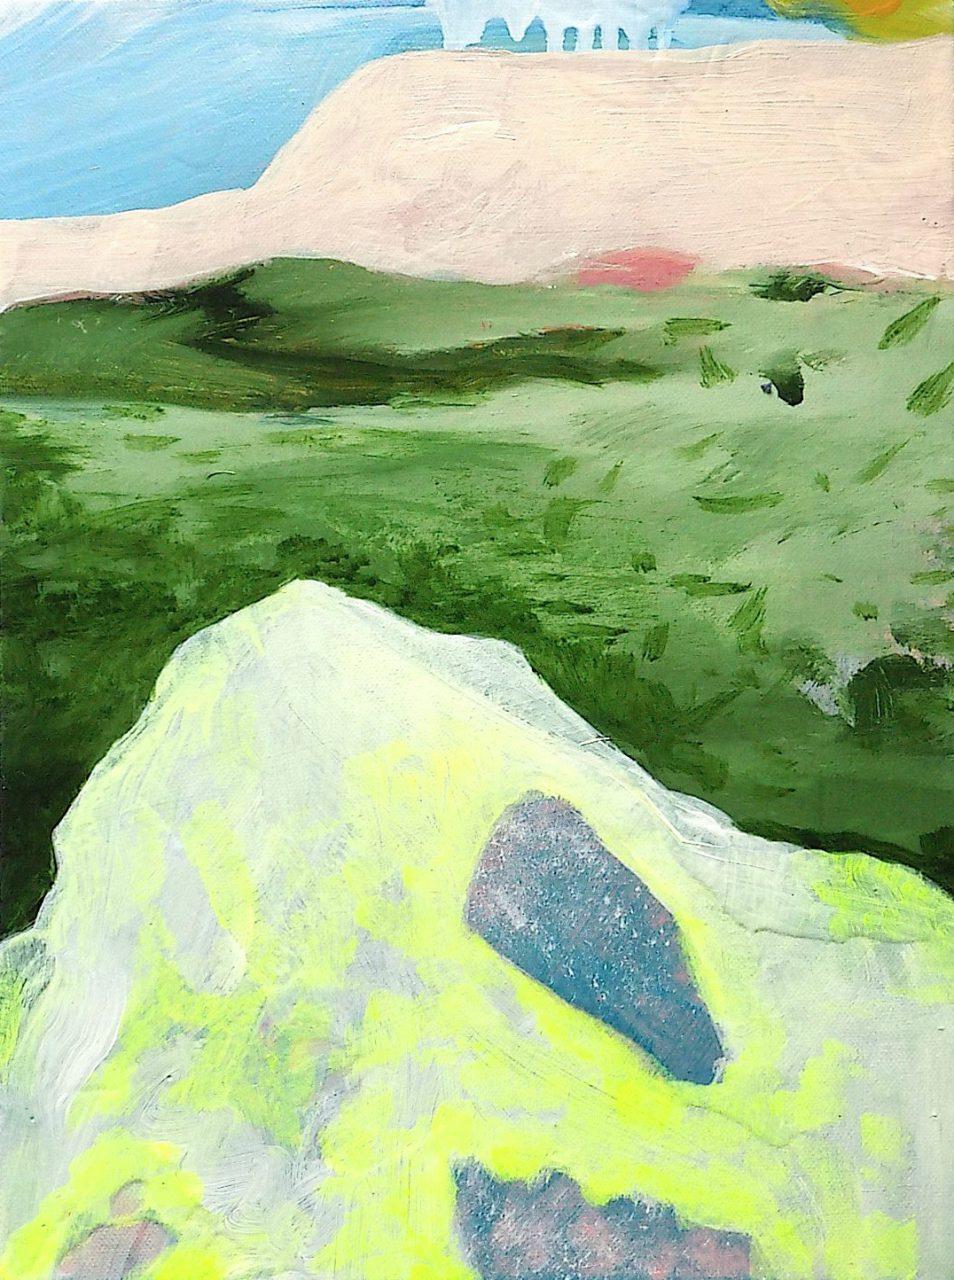 Jan Ziegler_untitled_2016_acrylic on canvas_40x30cm